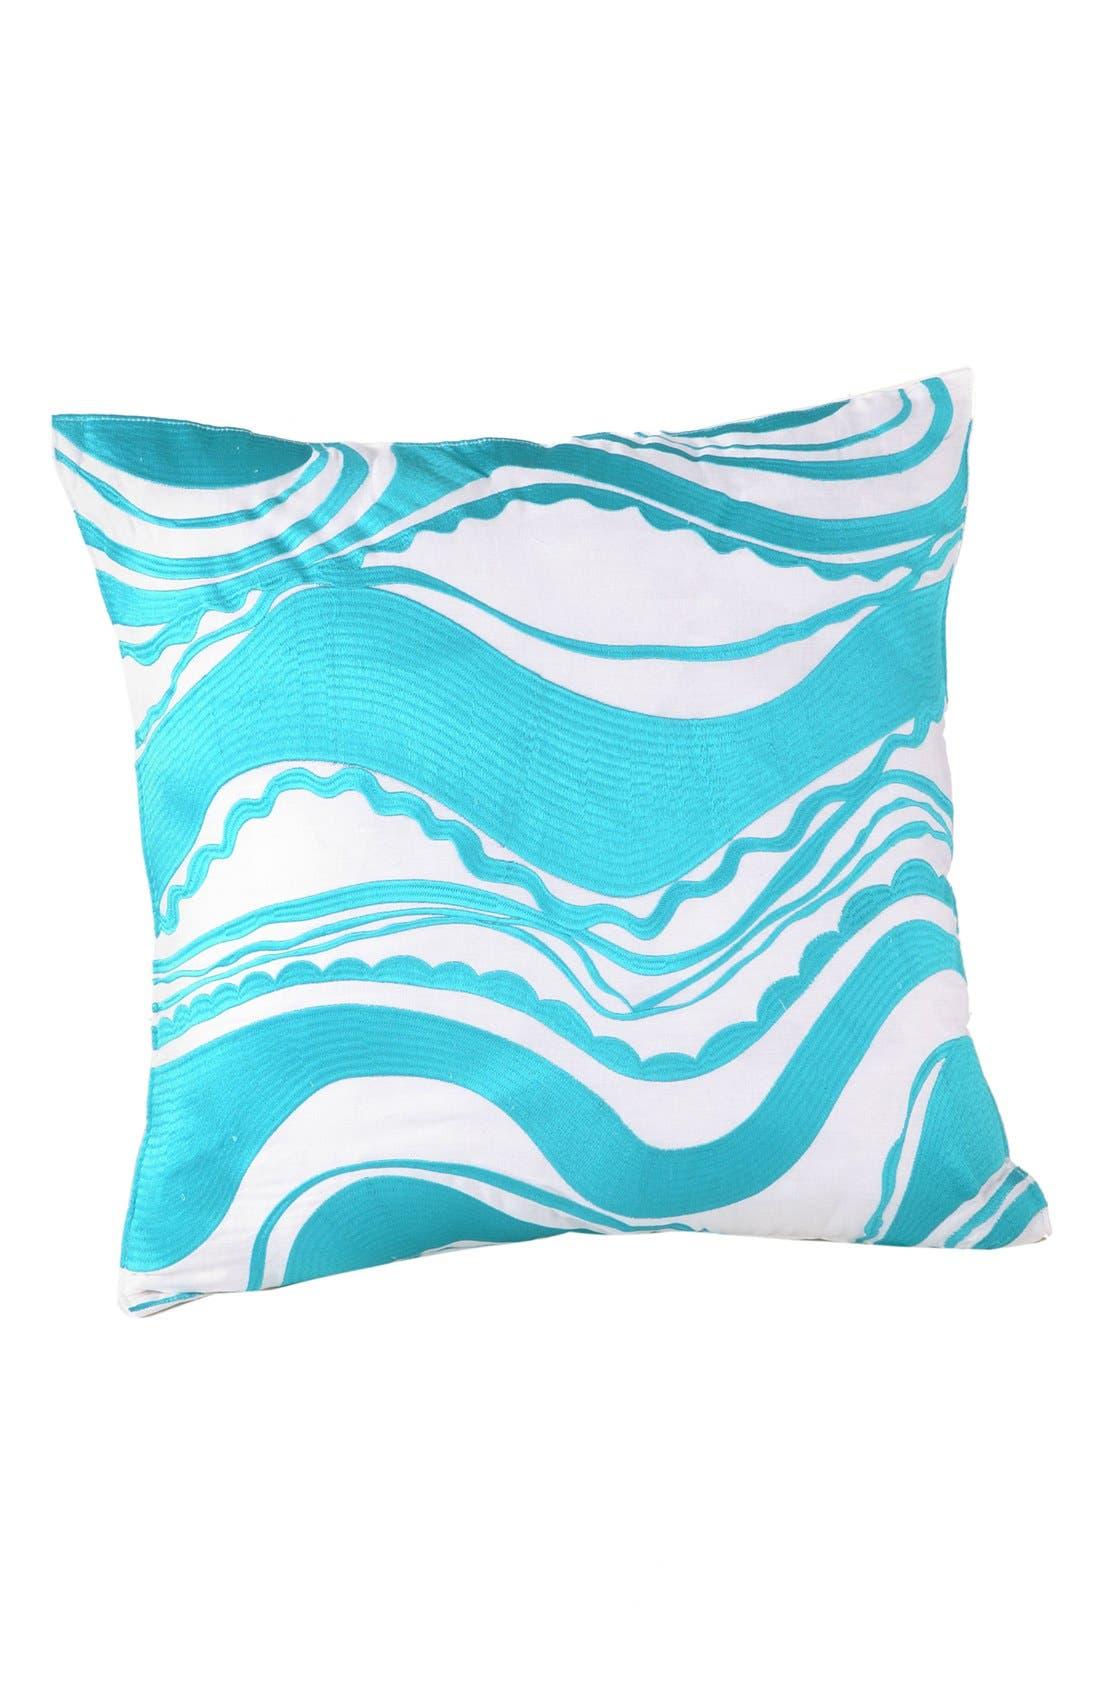 Alternate Image 1 Selected - Trina Turk 'Horizon Stripe' Pillow